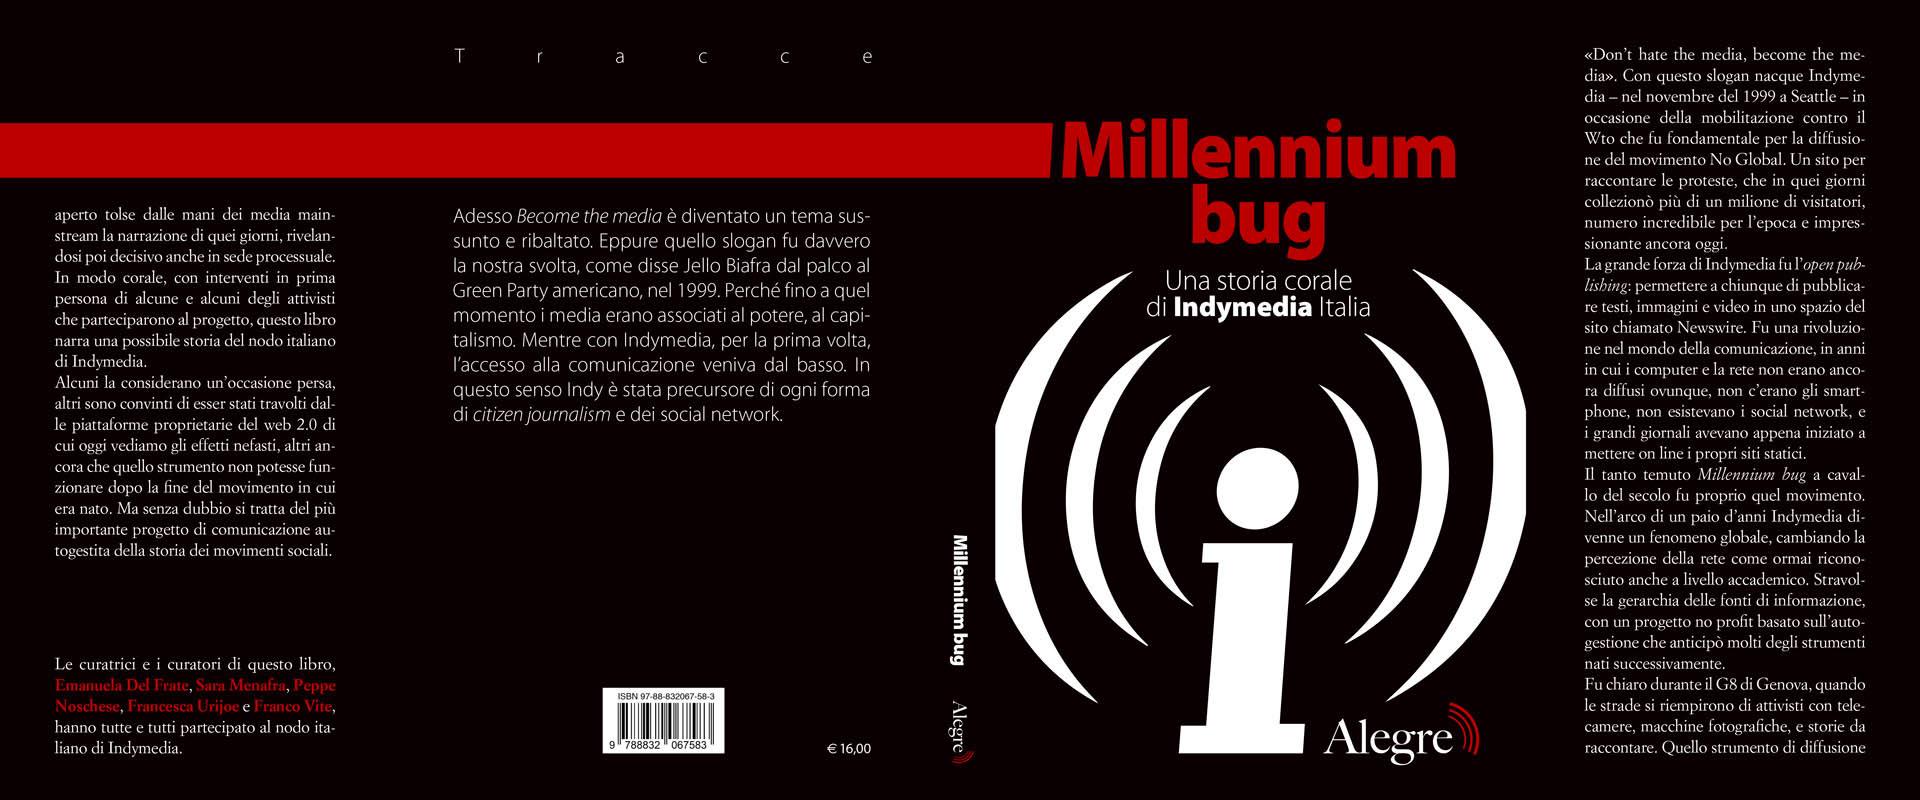 Millennium_bug_copertina_stesa